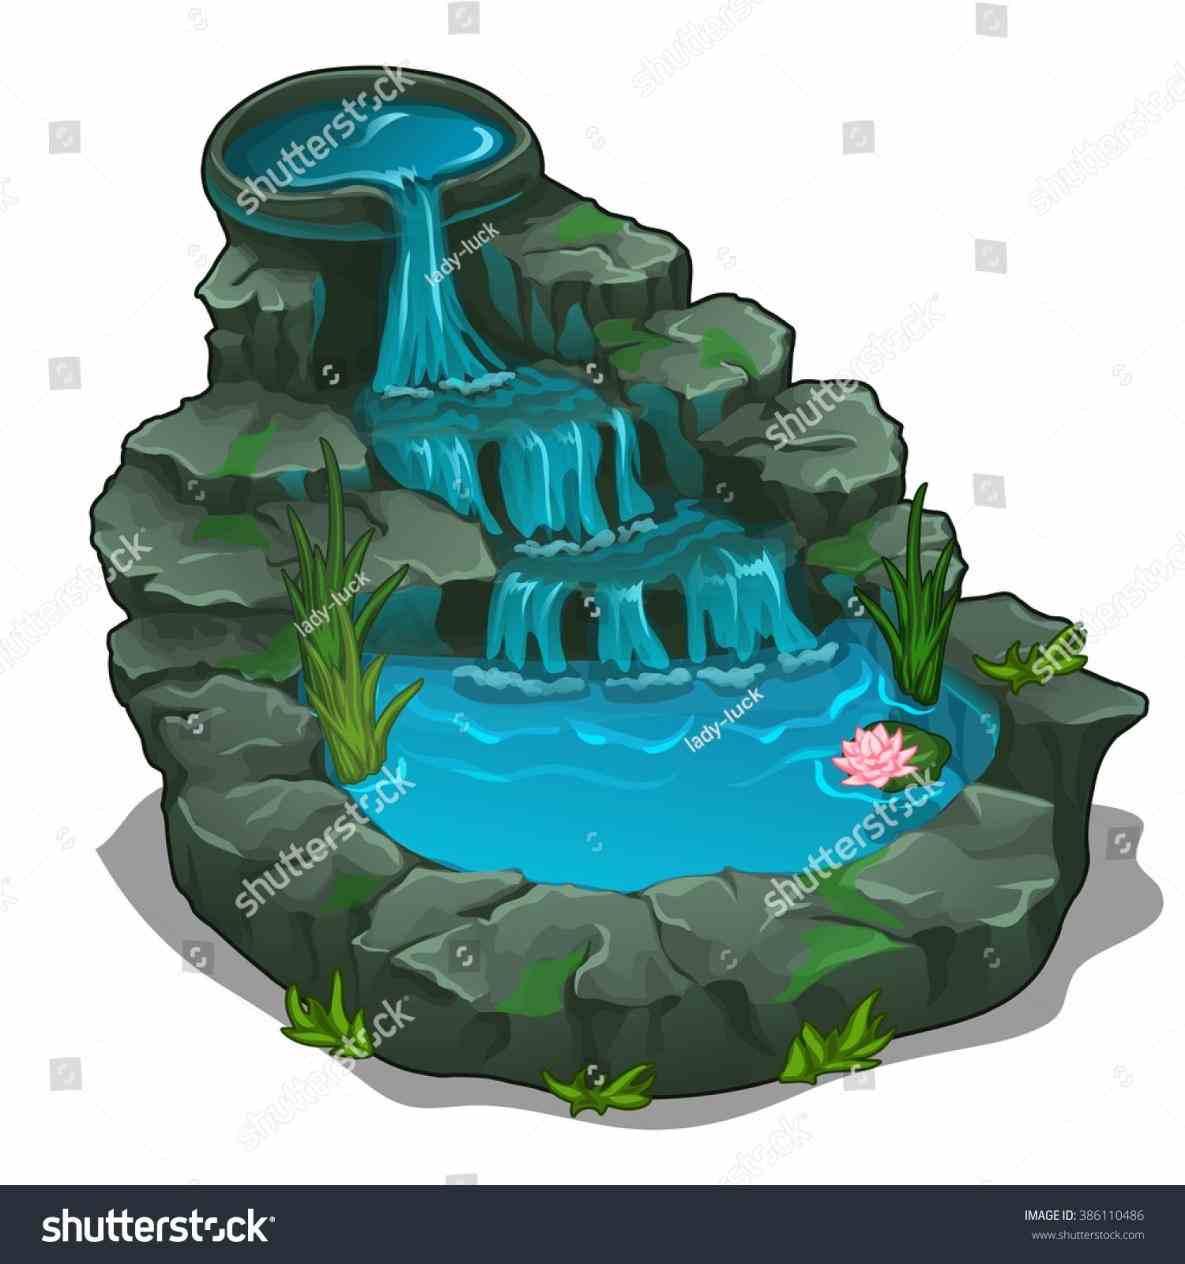 Fountain clipart water pool. Garden feature ideas